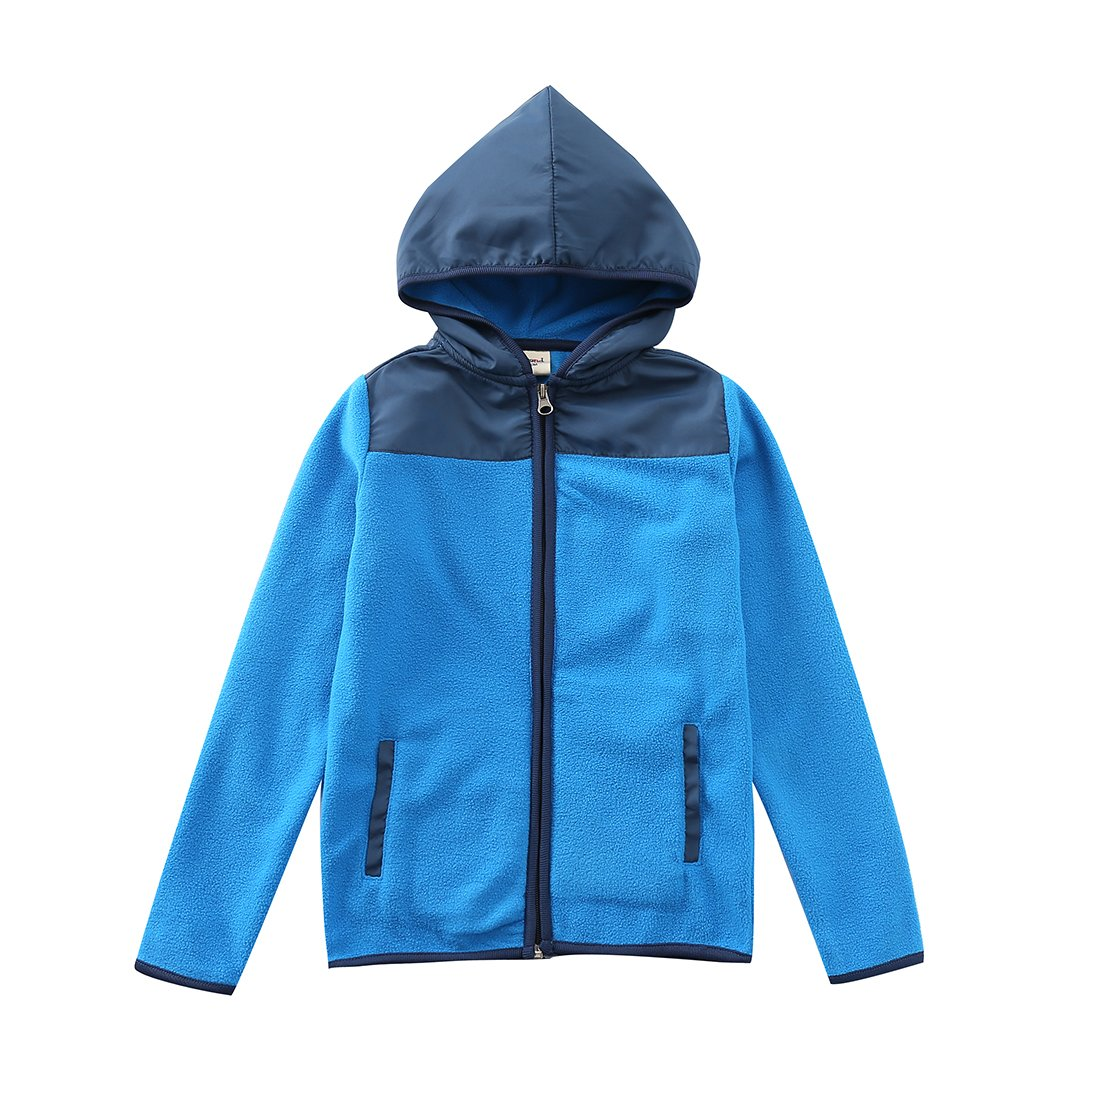 MOMOLAND Boys Girls Long Sleeve Hooded Zip Fleece Jackets with Pockets